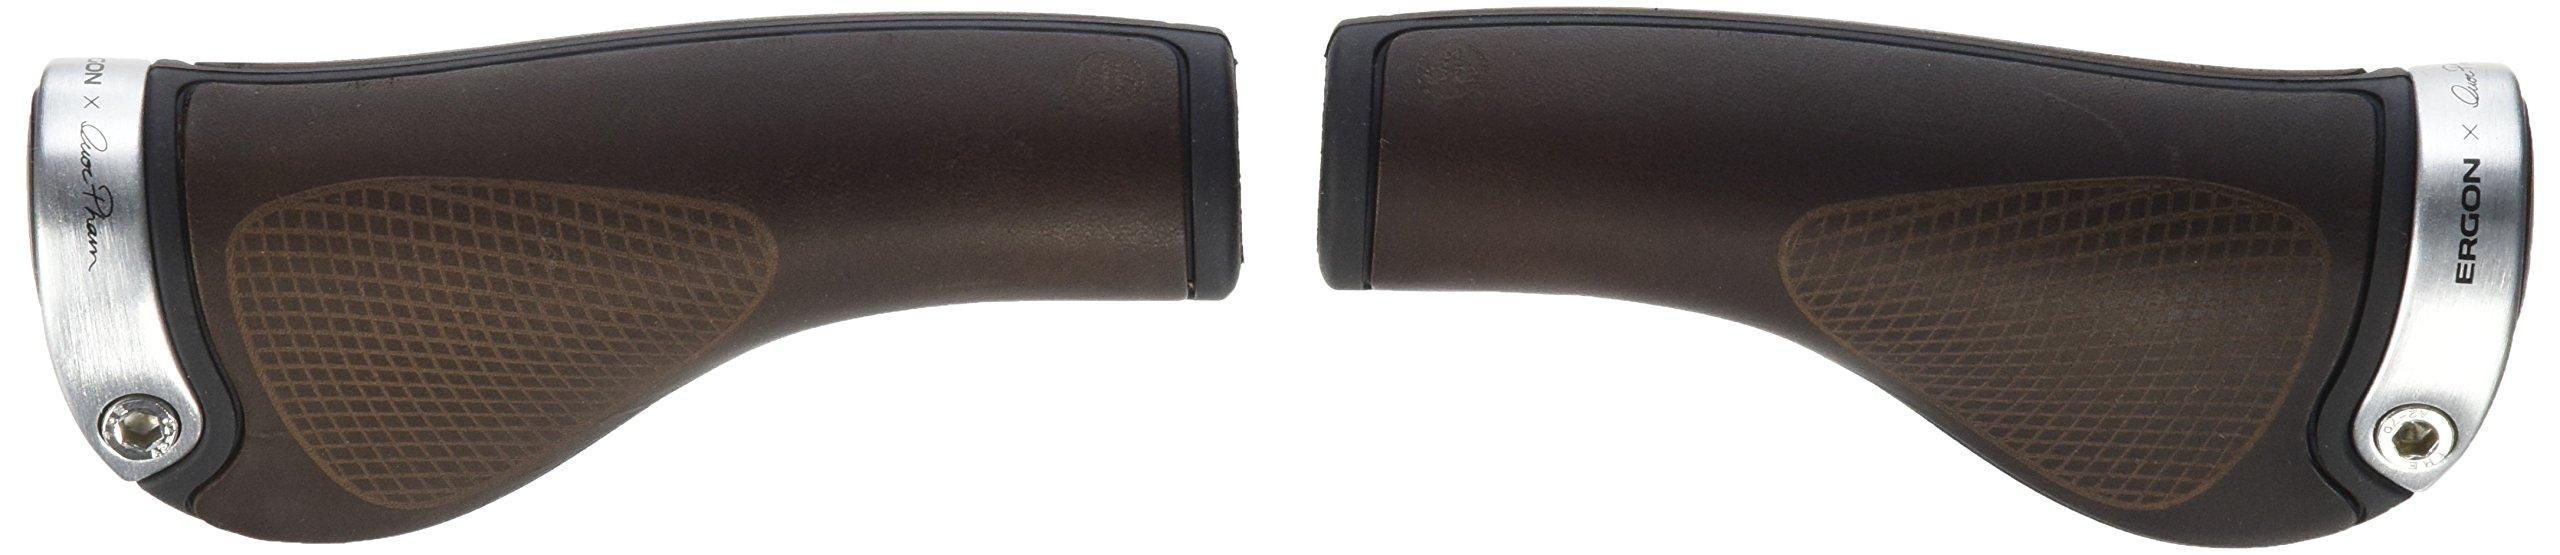 Ergon grips GP1 BioLeder brown (silver clamps)